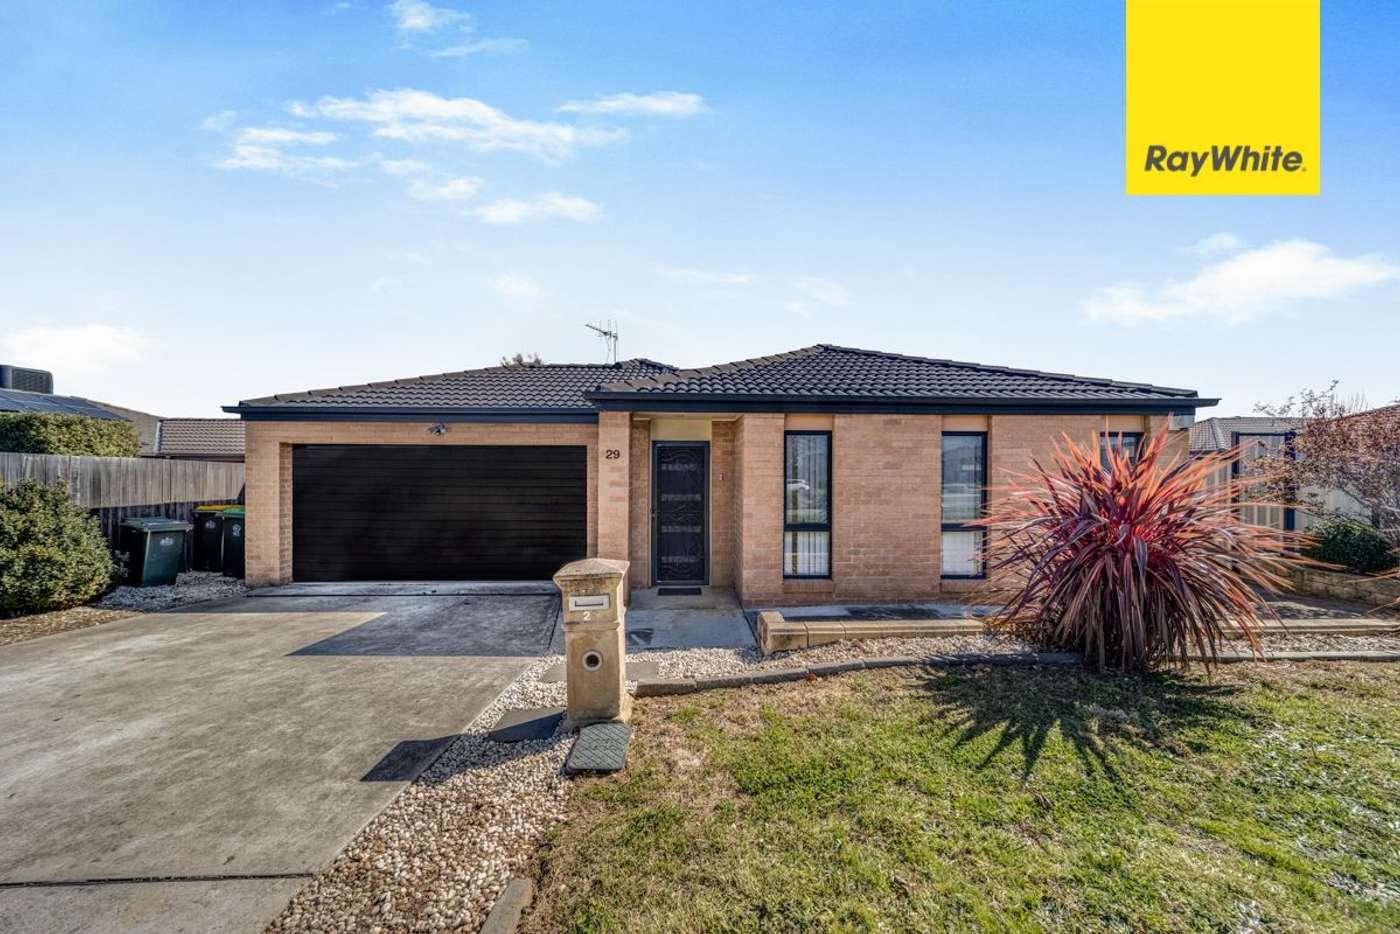 Main view of Homely house listing, 29 Macfarlane Burnet Avenue, Macgregor ACT 2615